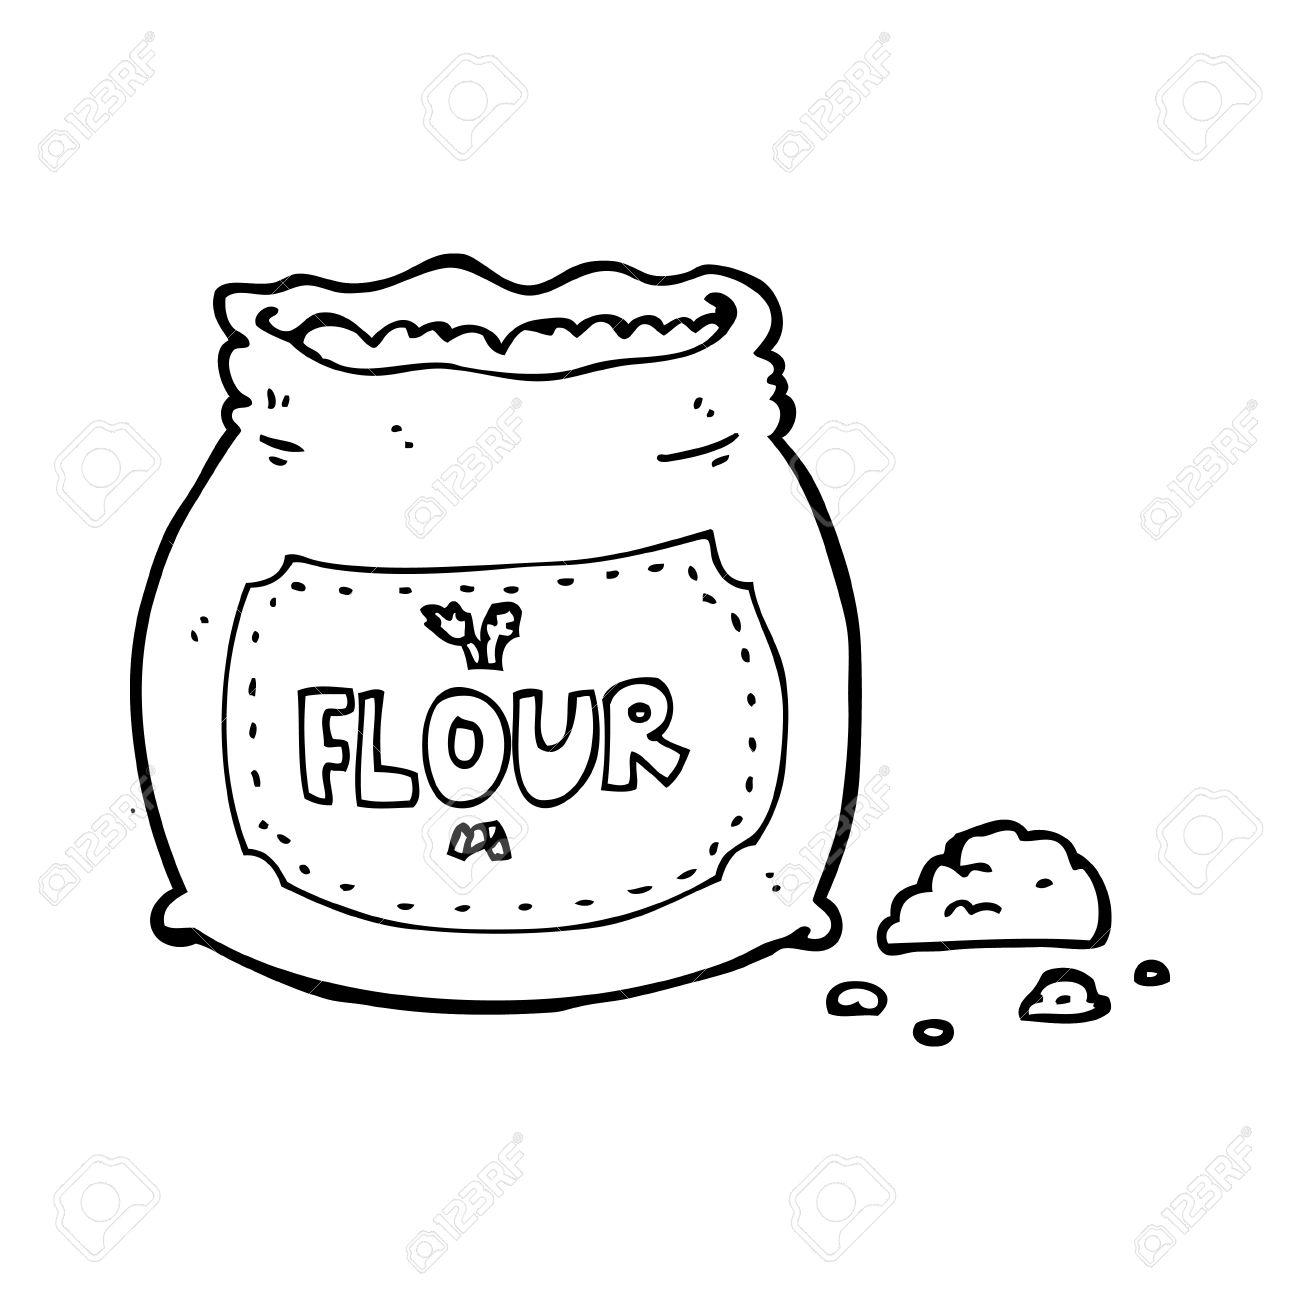 cartoon bag of flour royalty free cliparts vectors and stock illustration image 25010351 cartoon bag of flour